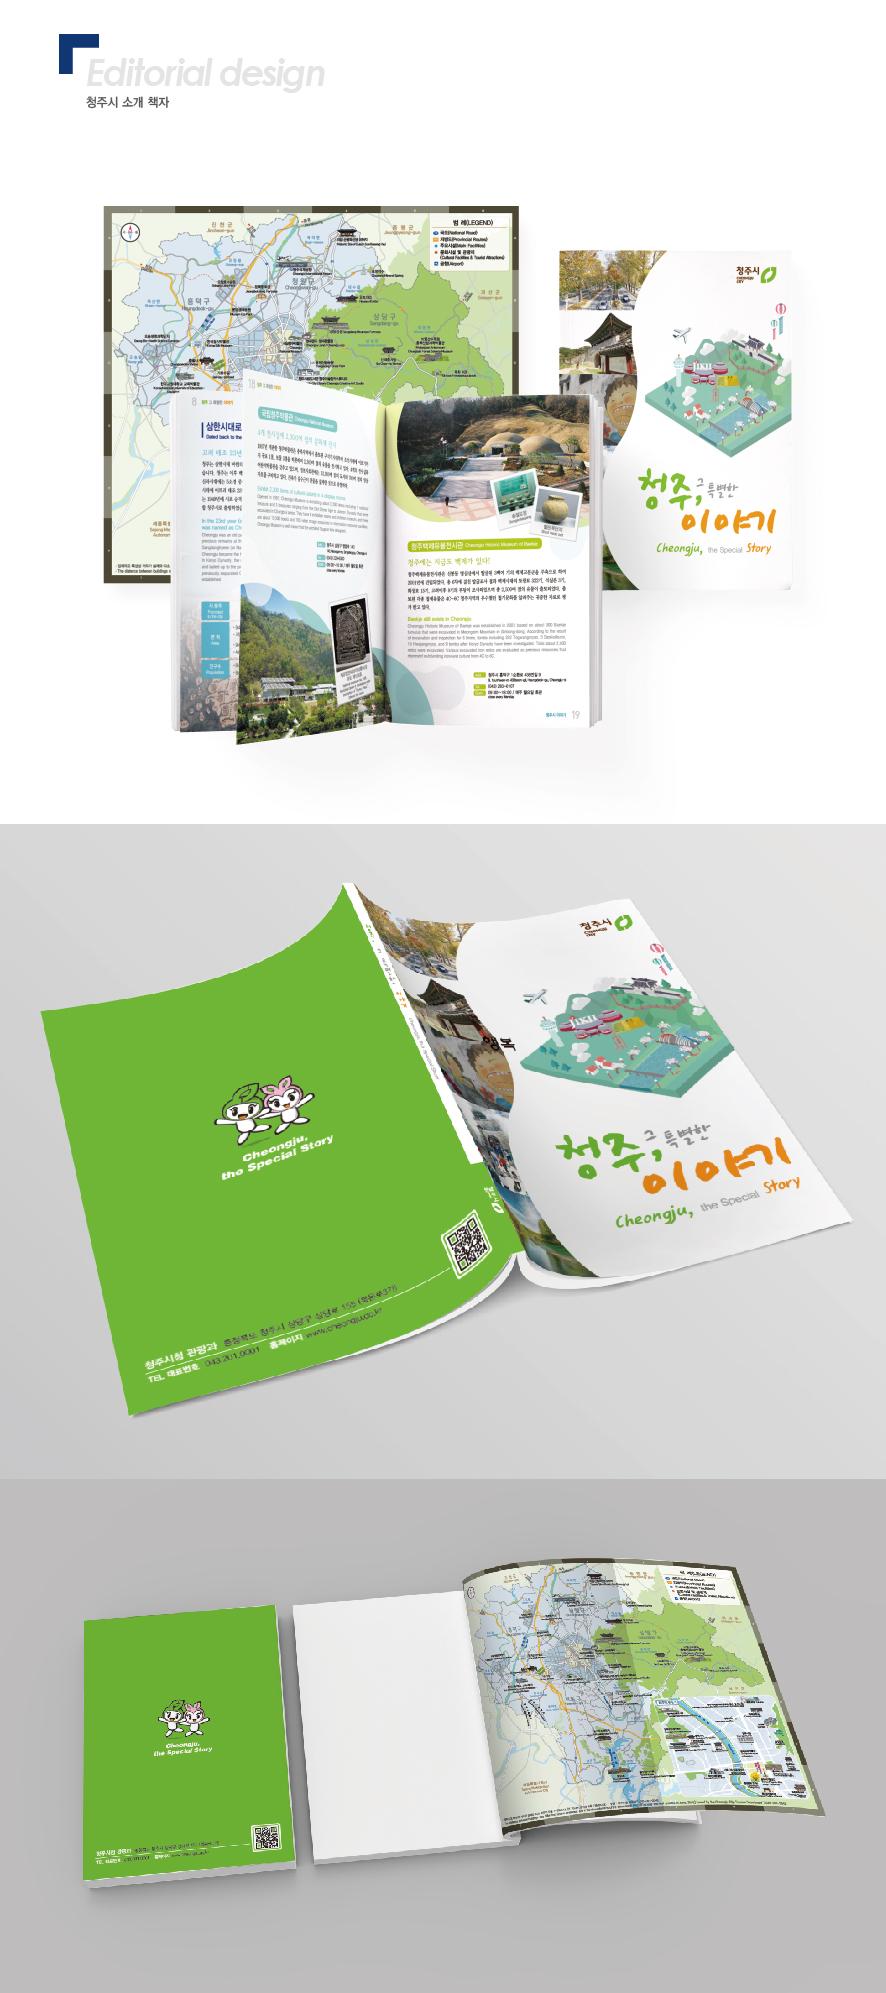 02 Editorial design-03.jpg